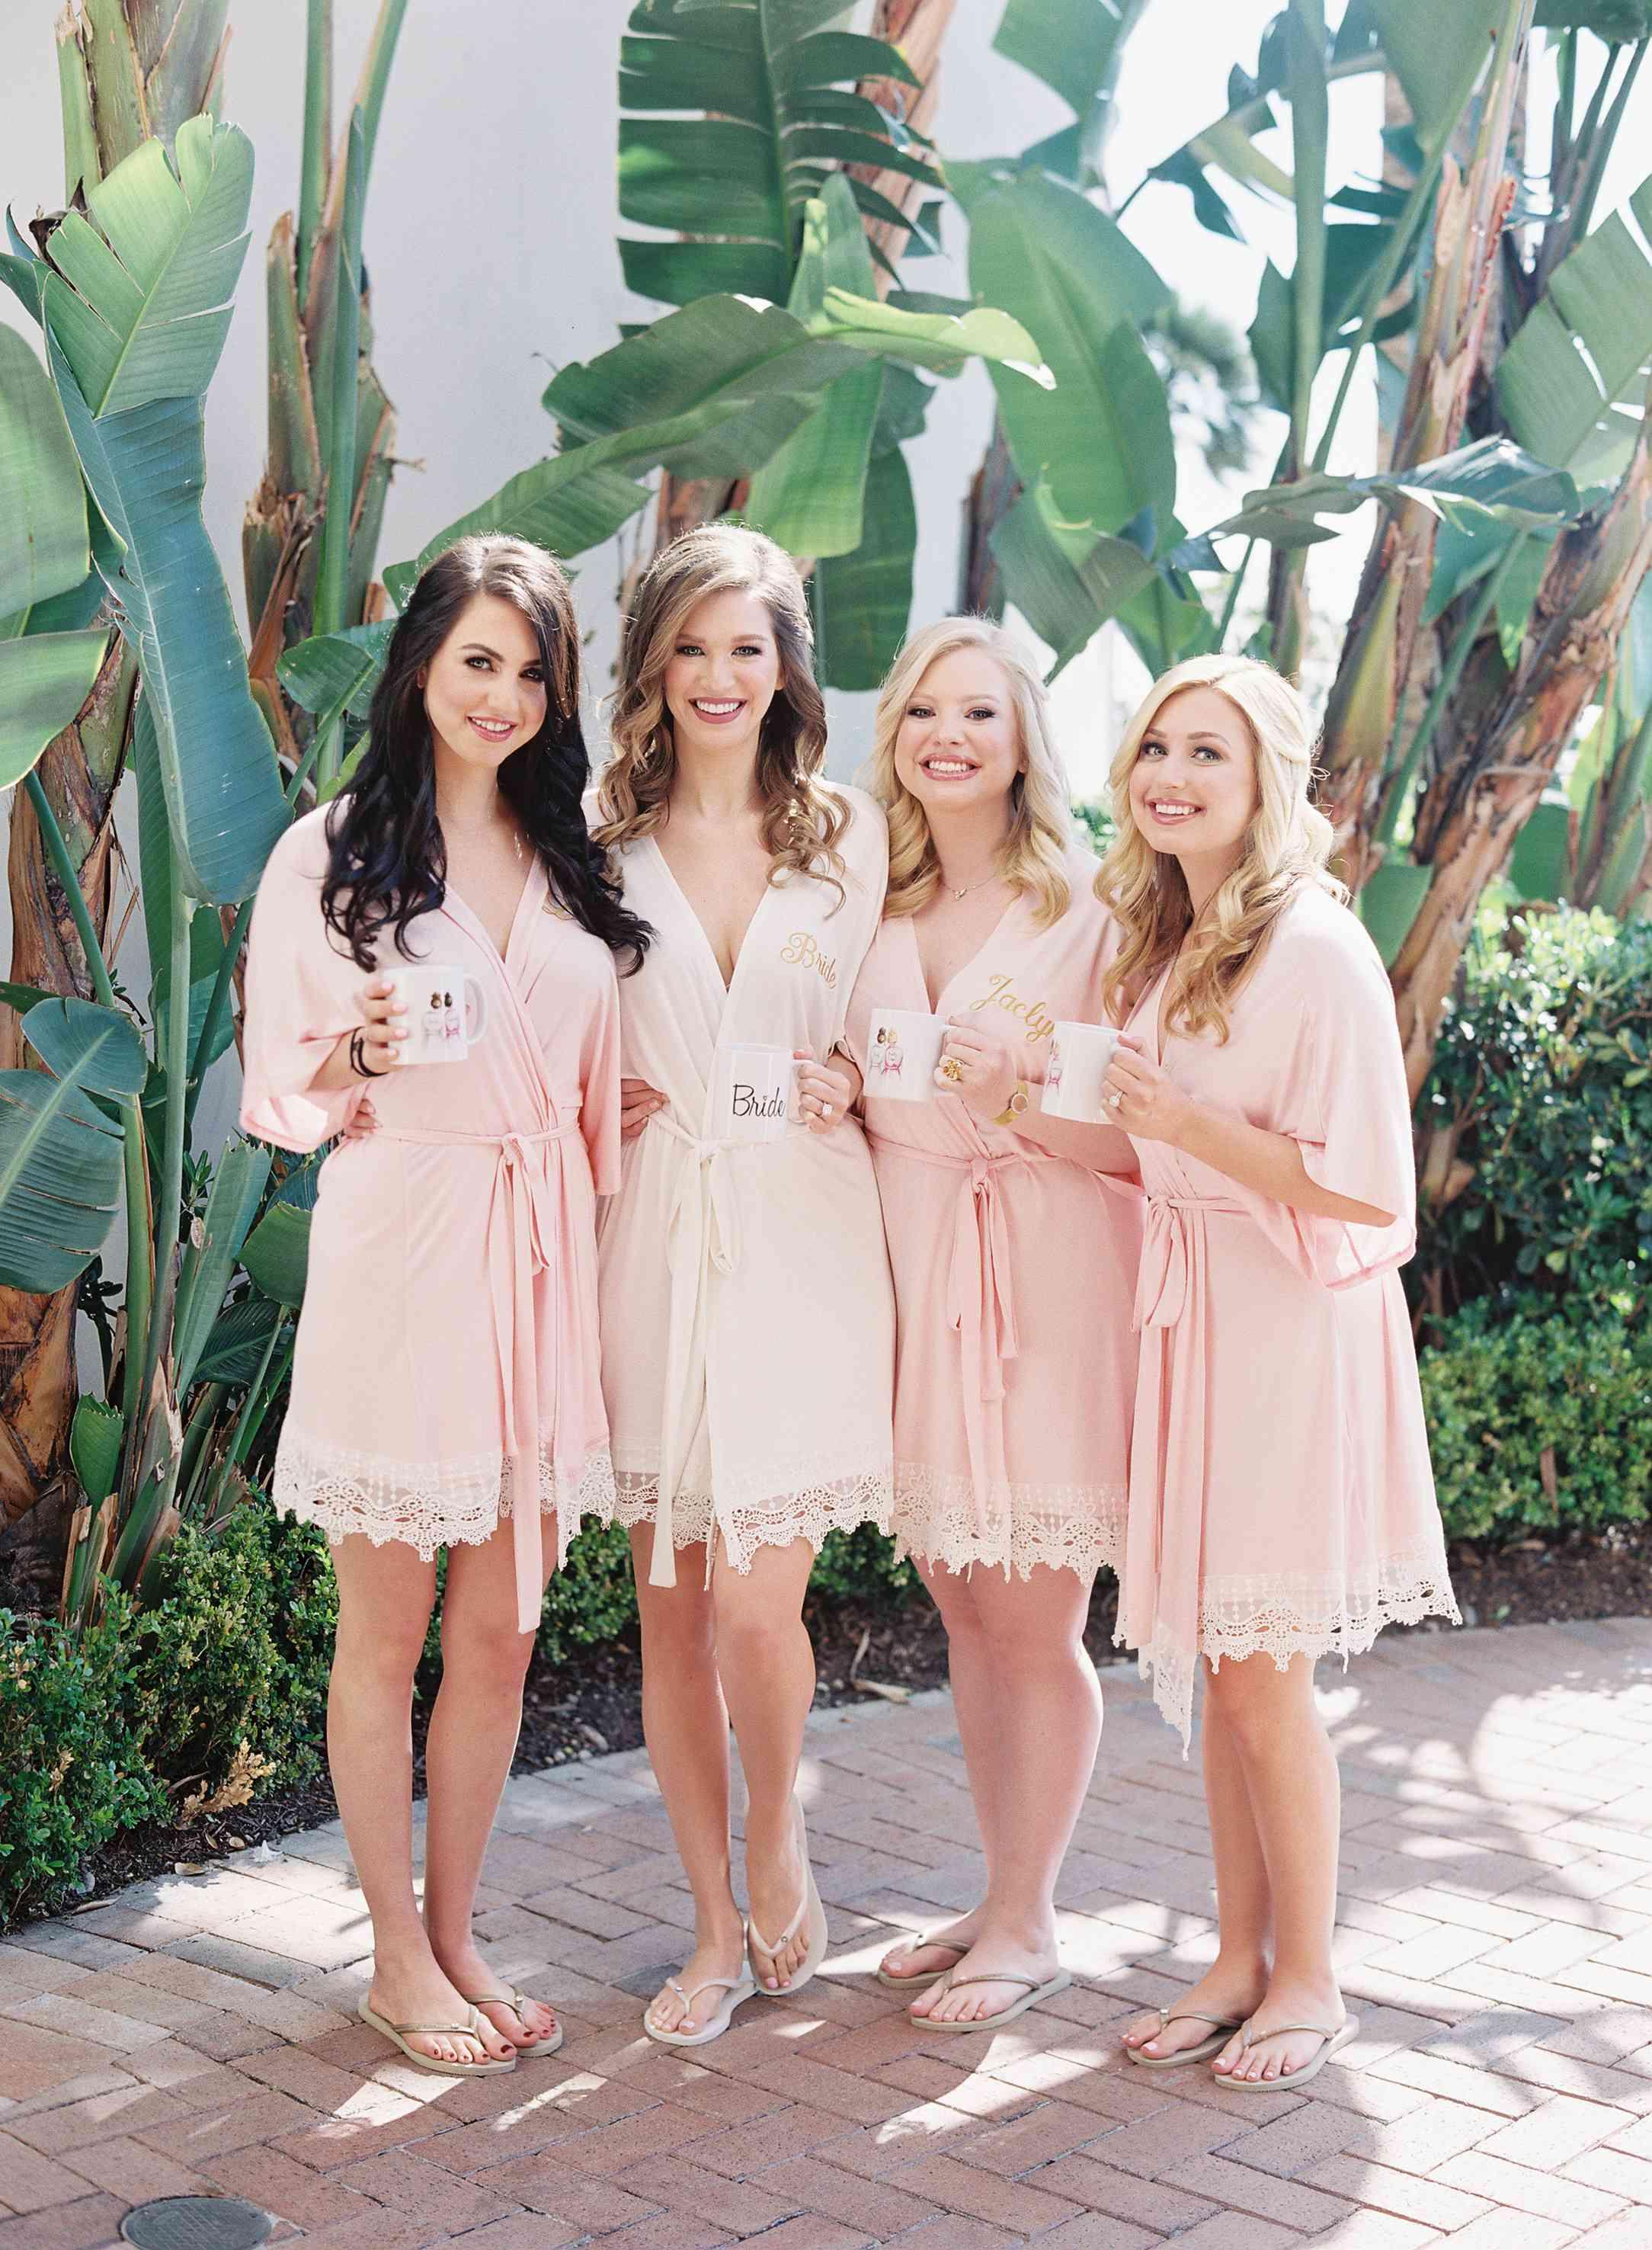 Bridesmaids with matching robes and mugs